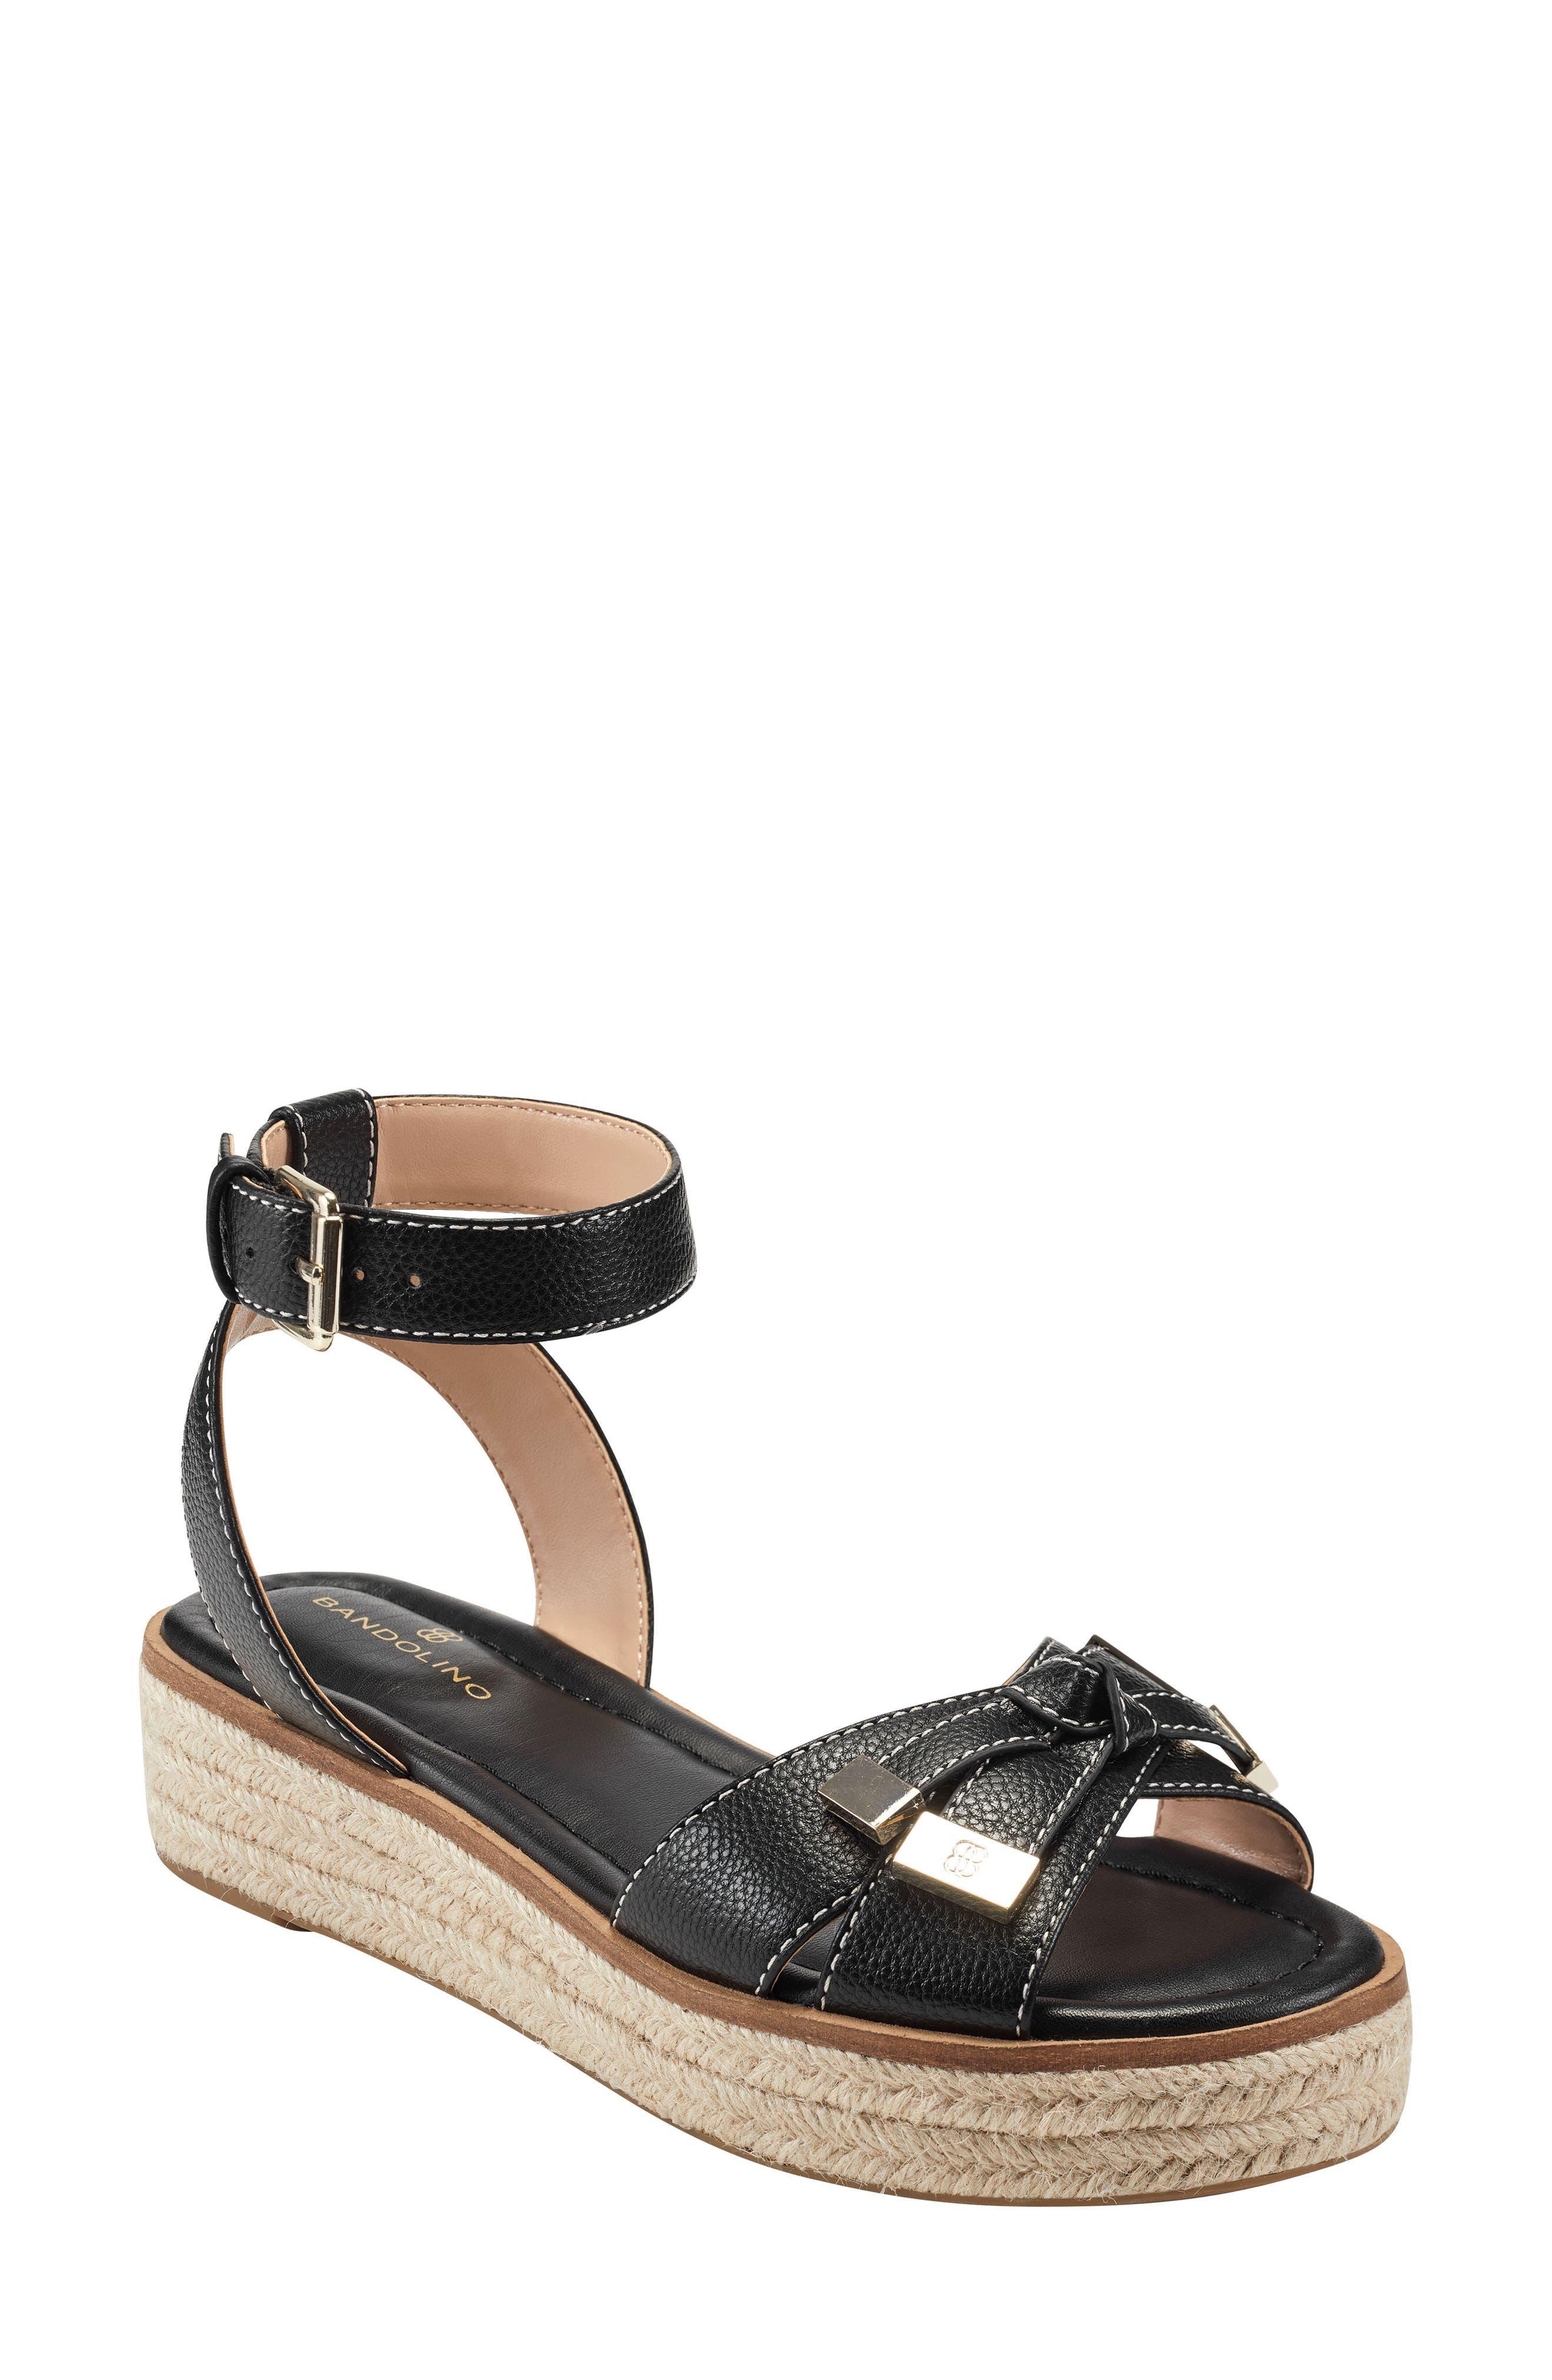 Pattii Espadrille Platform Sandal